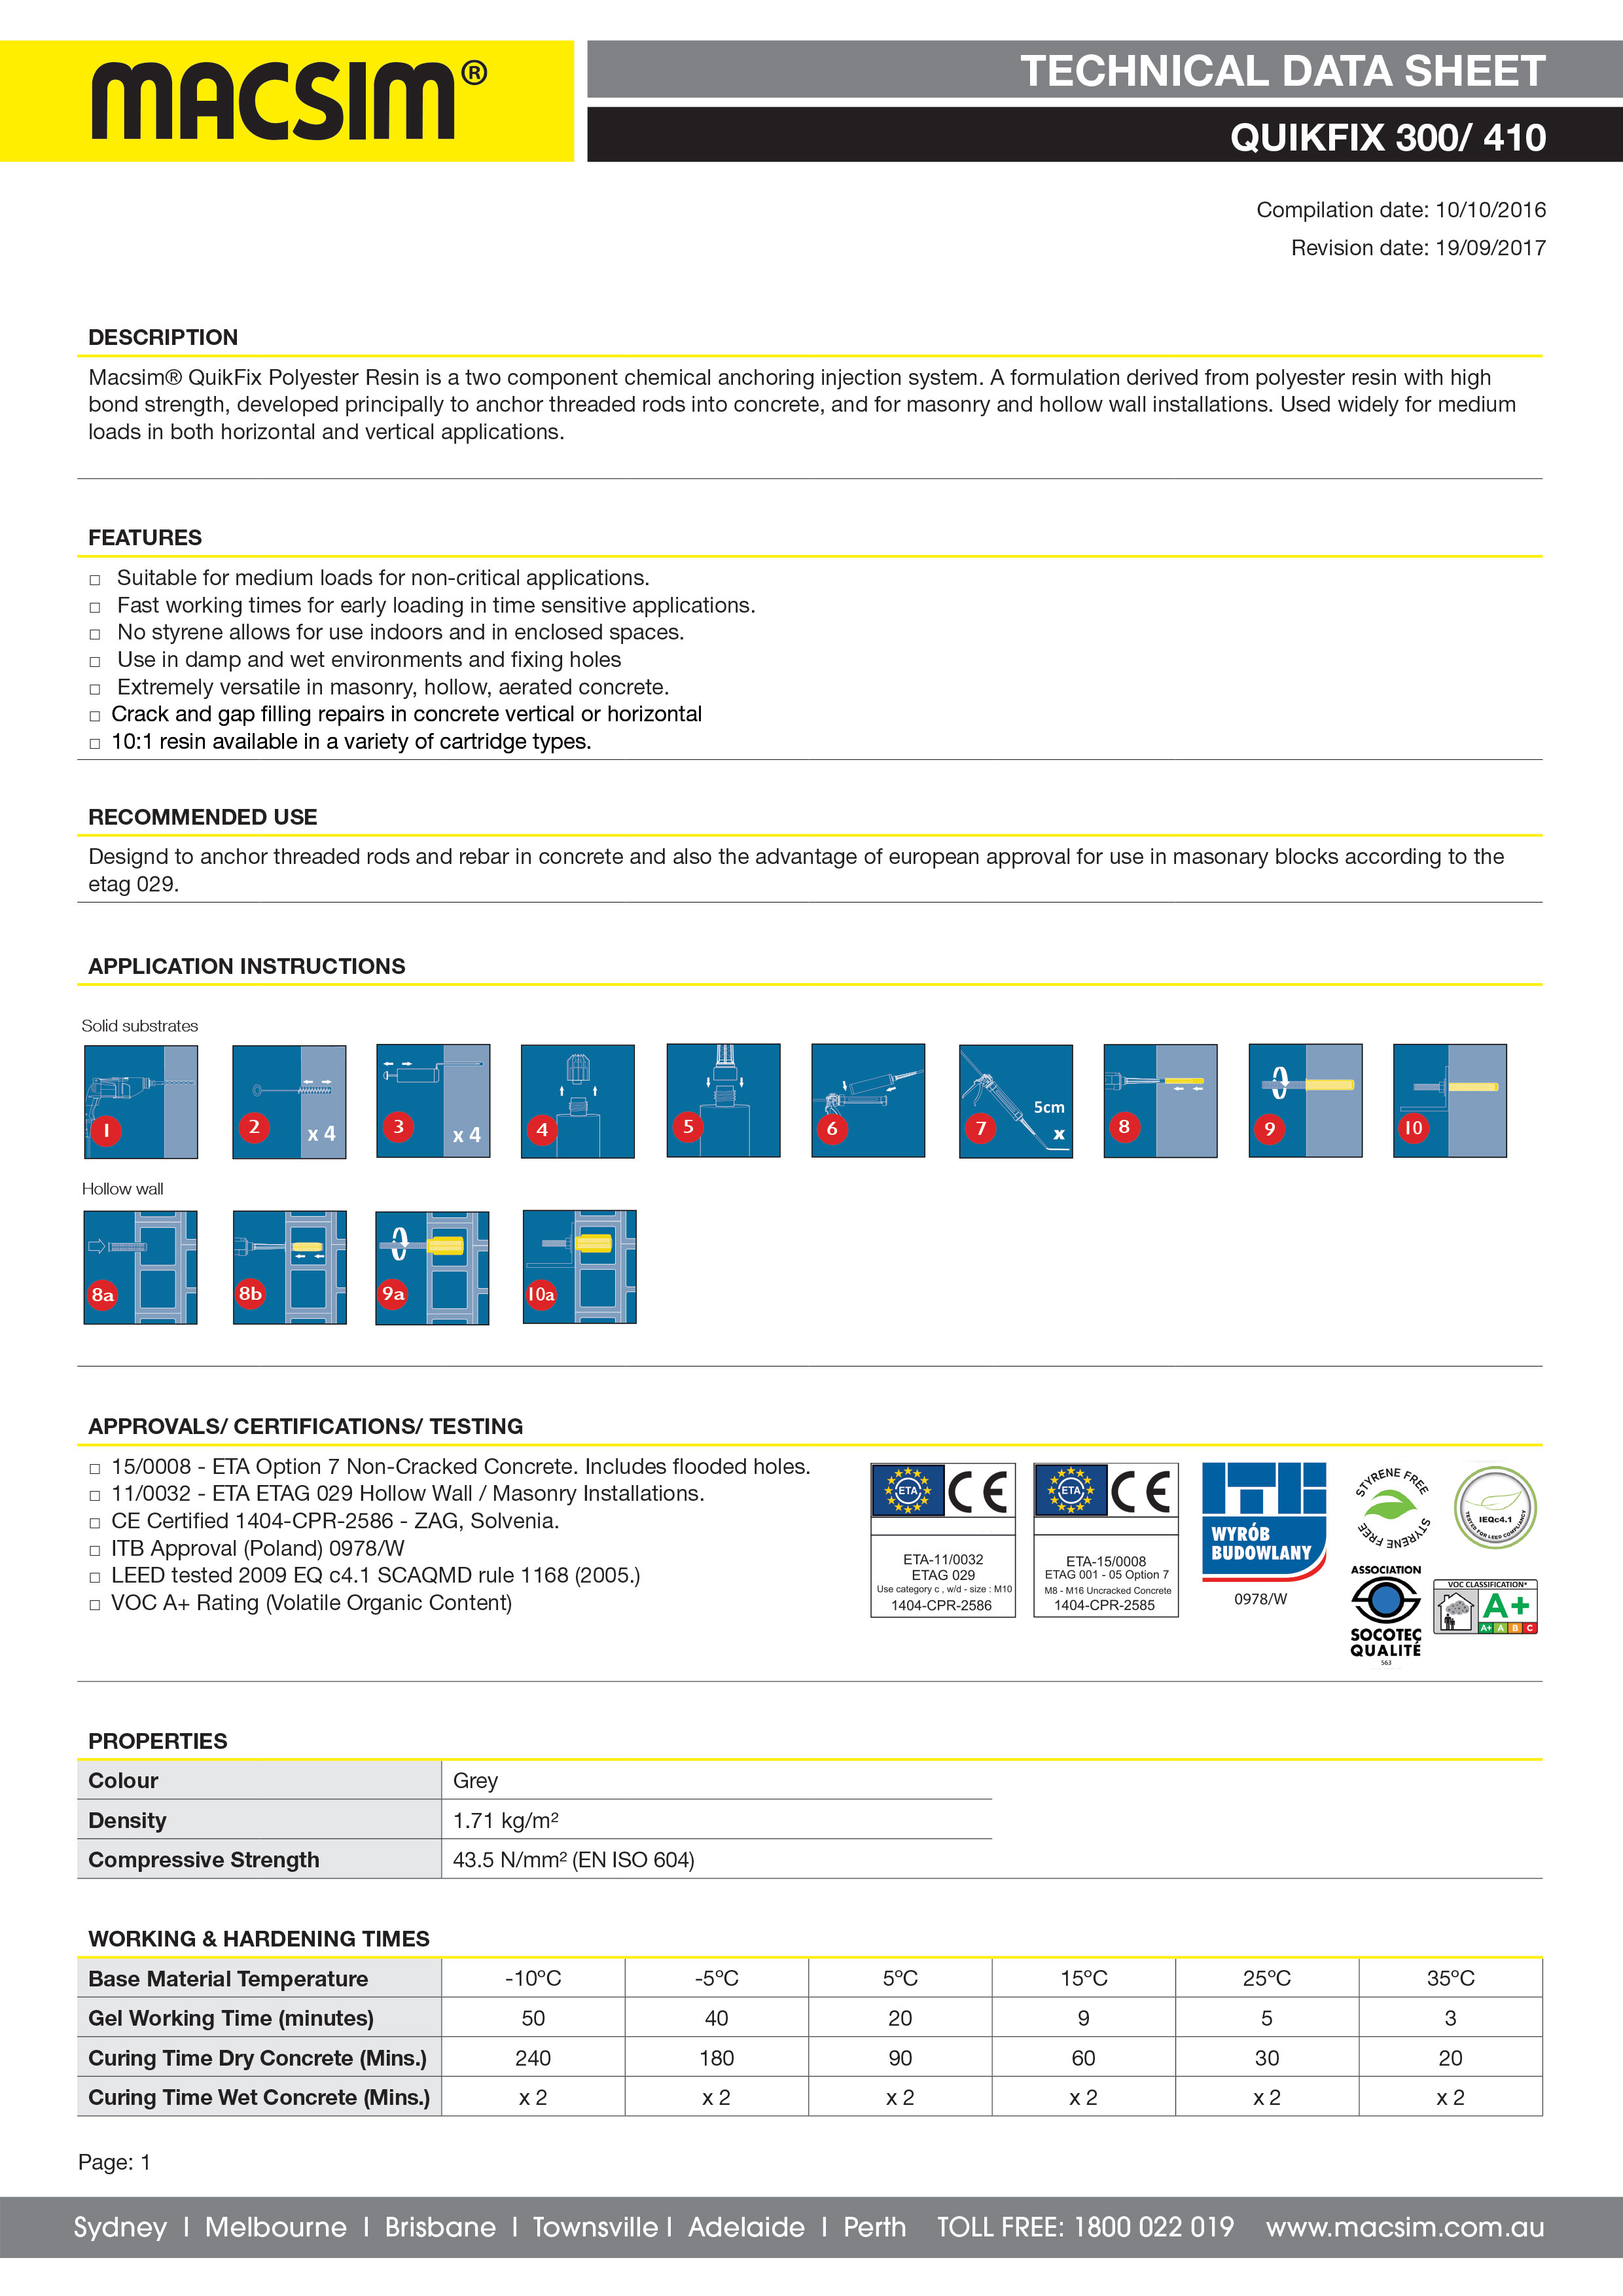 71PC Quikfix Technical Data Sheet